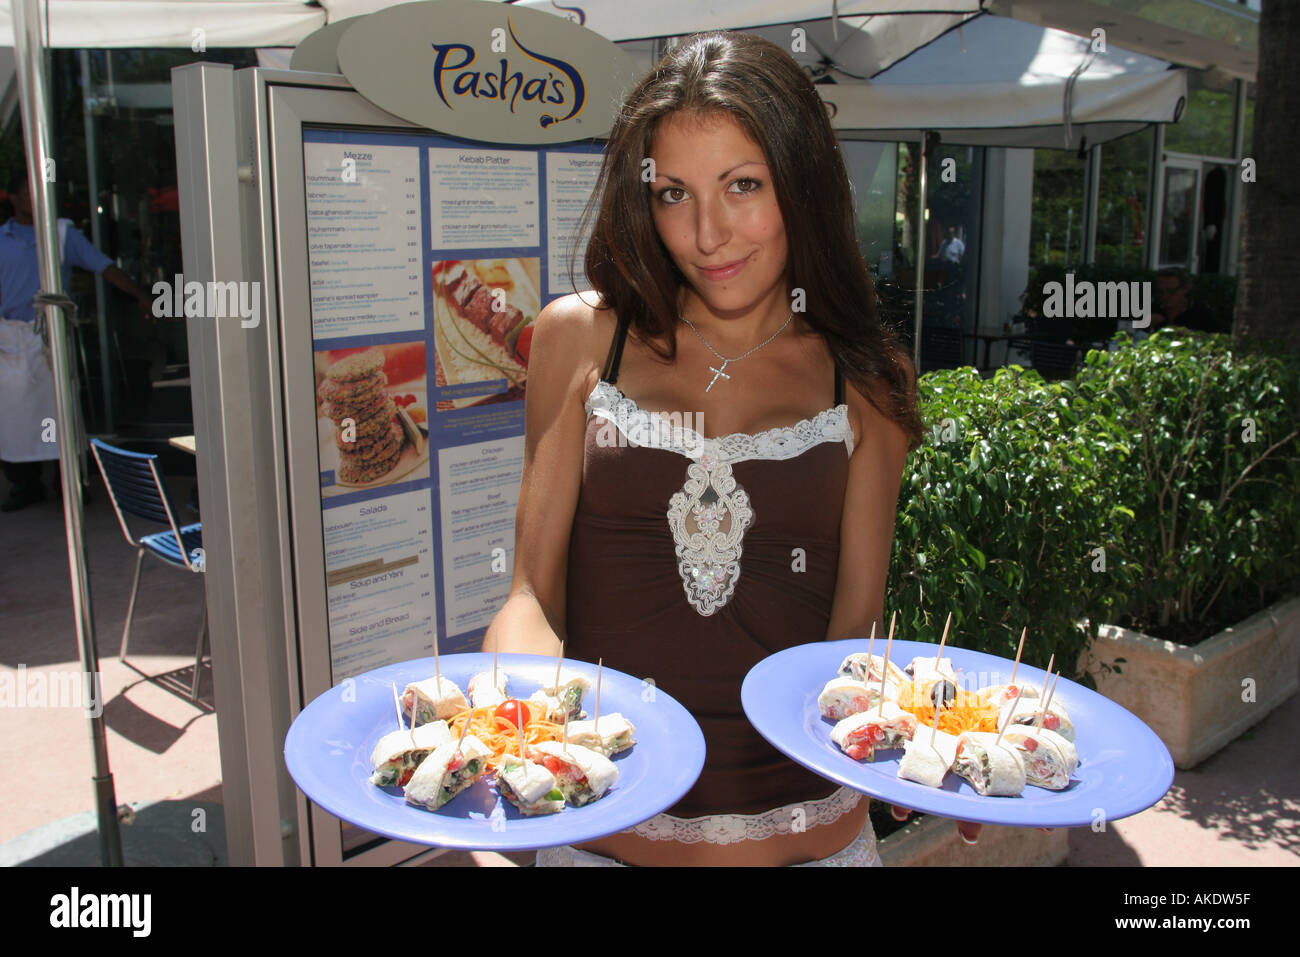 Miami Beach Florida Lincoln Road Mall Pashas Restaurant Female Hostess Sample Kebab Wrap